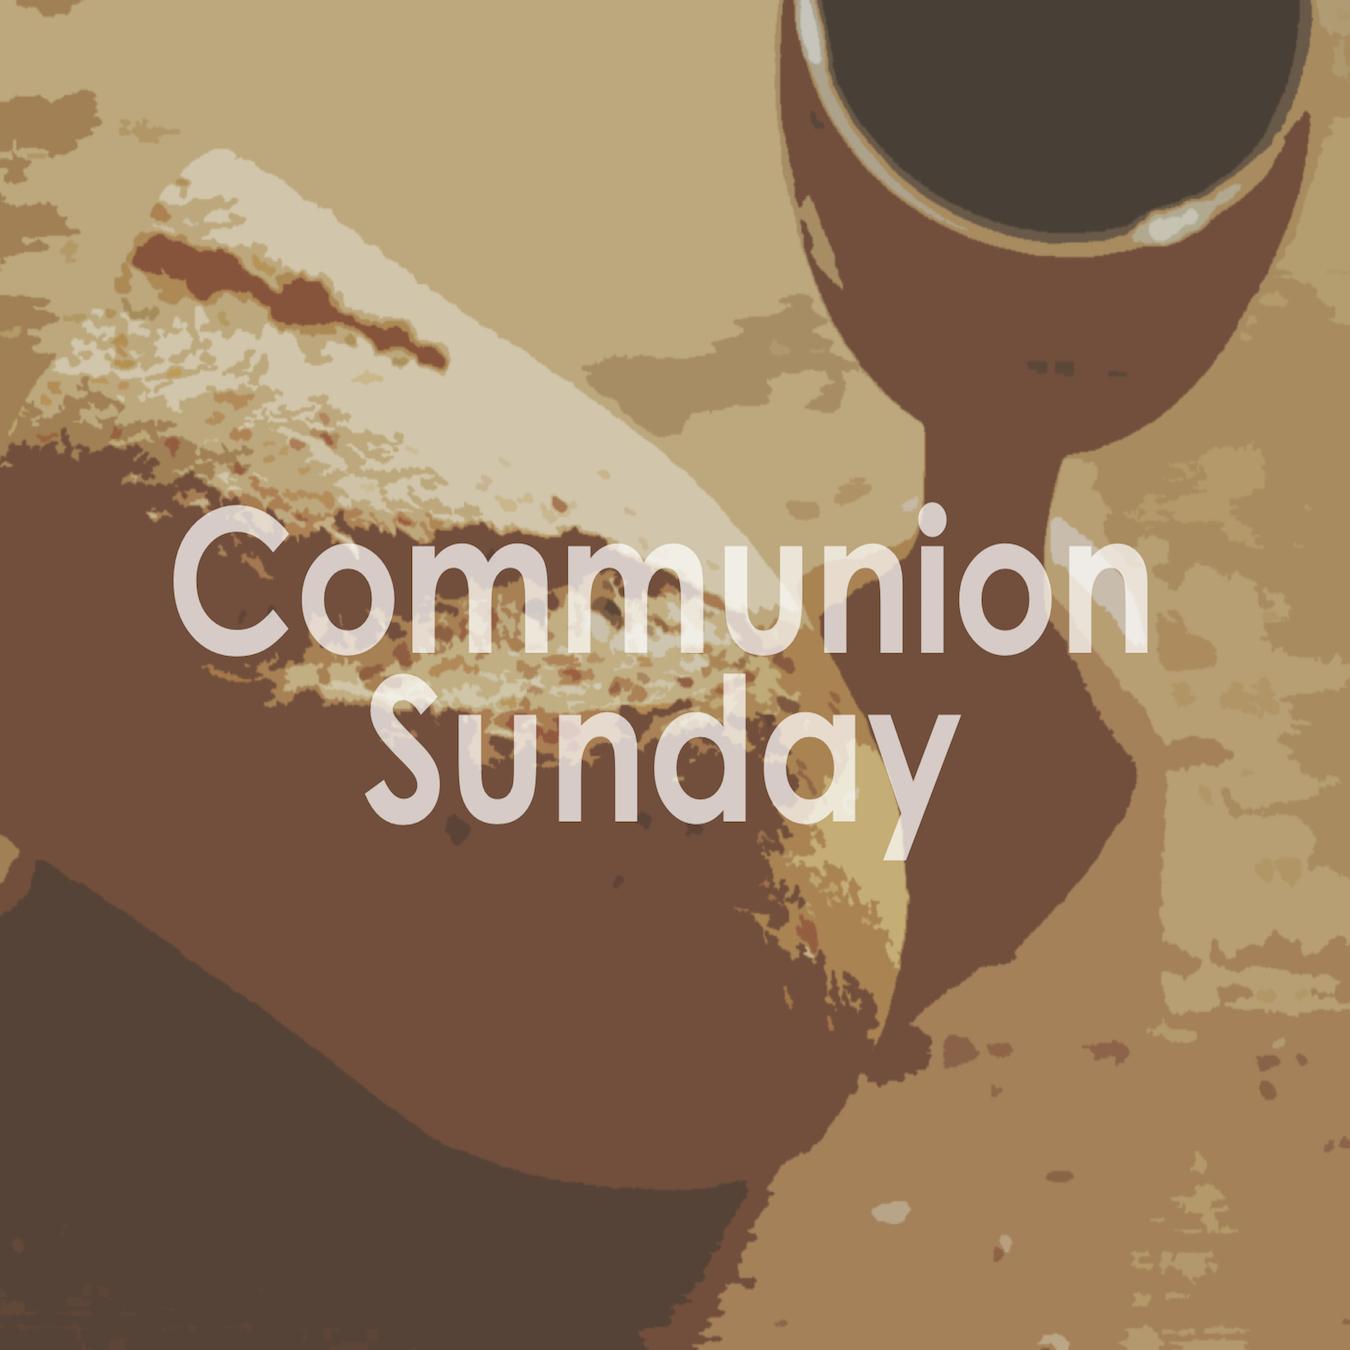 communionsundaysocial.jpg